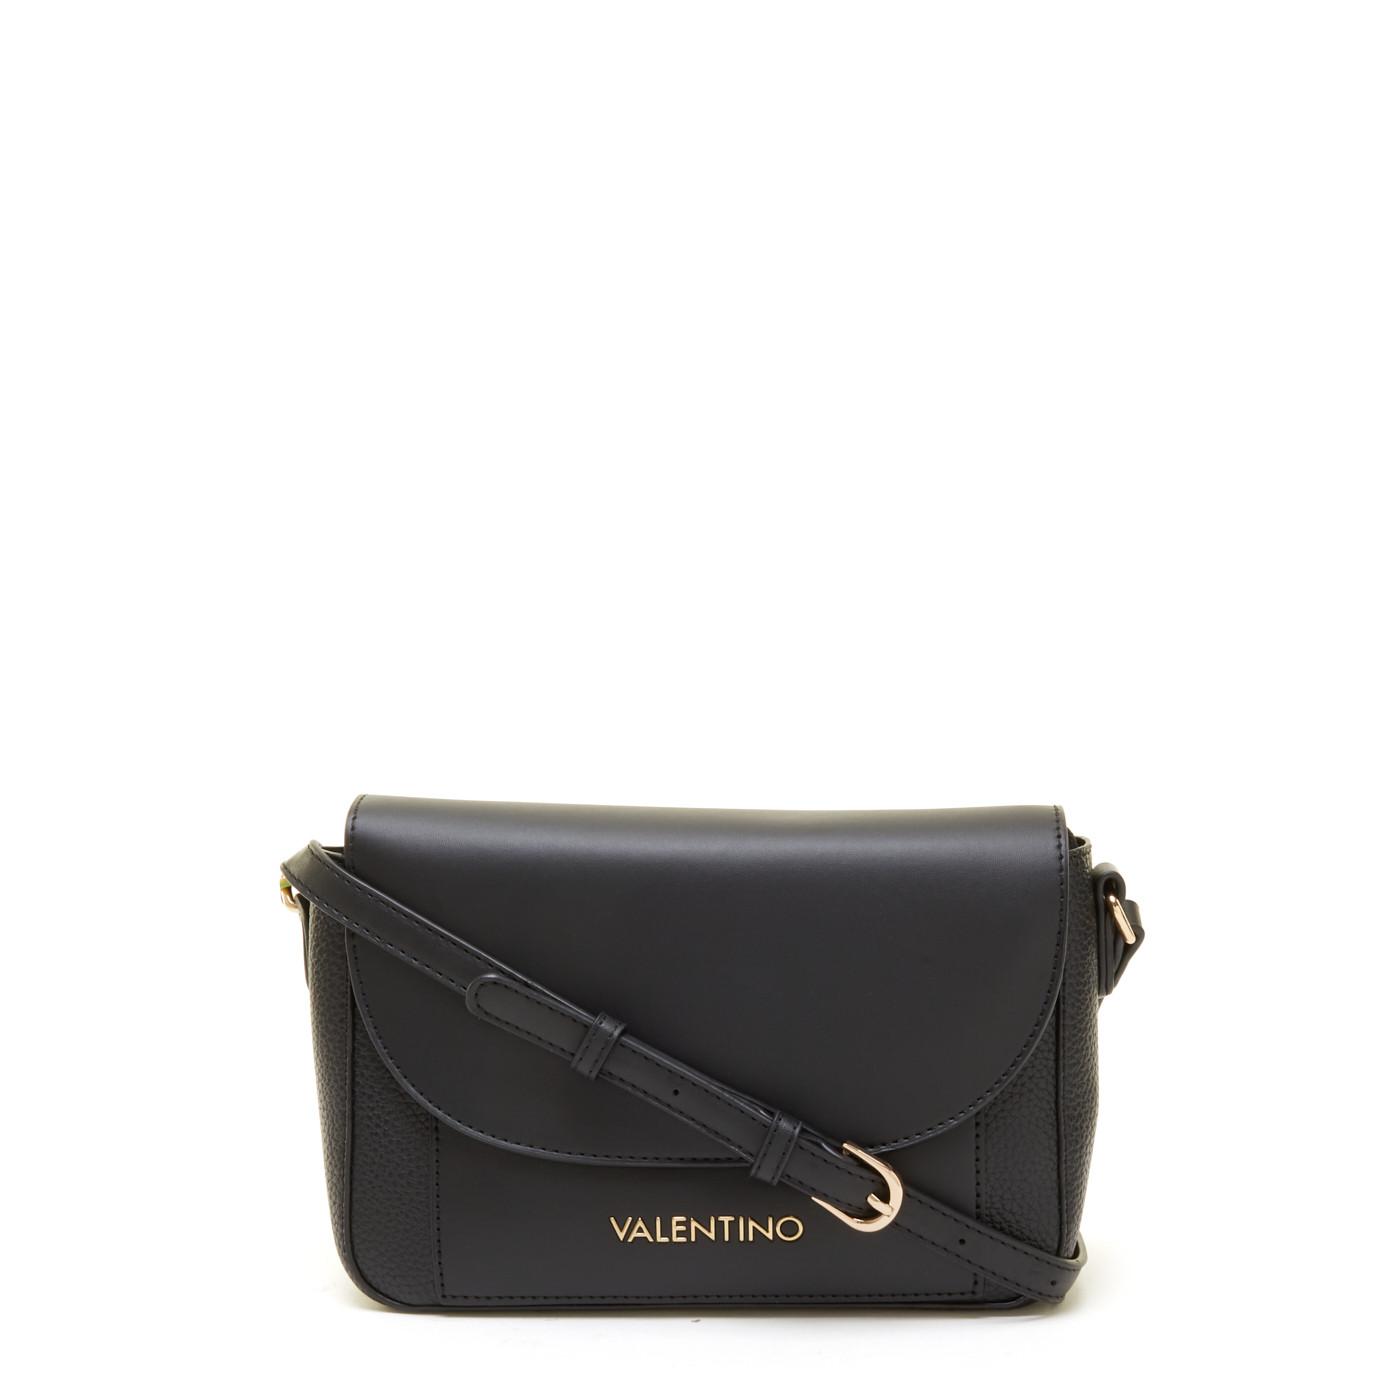 Valentino Bags Willow Nero Crossbody Tas VBS5K704NERO